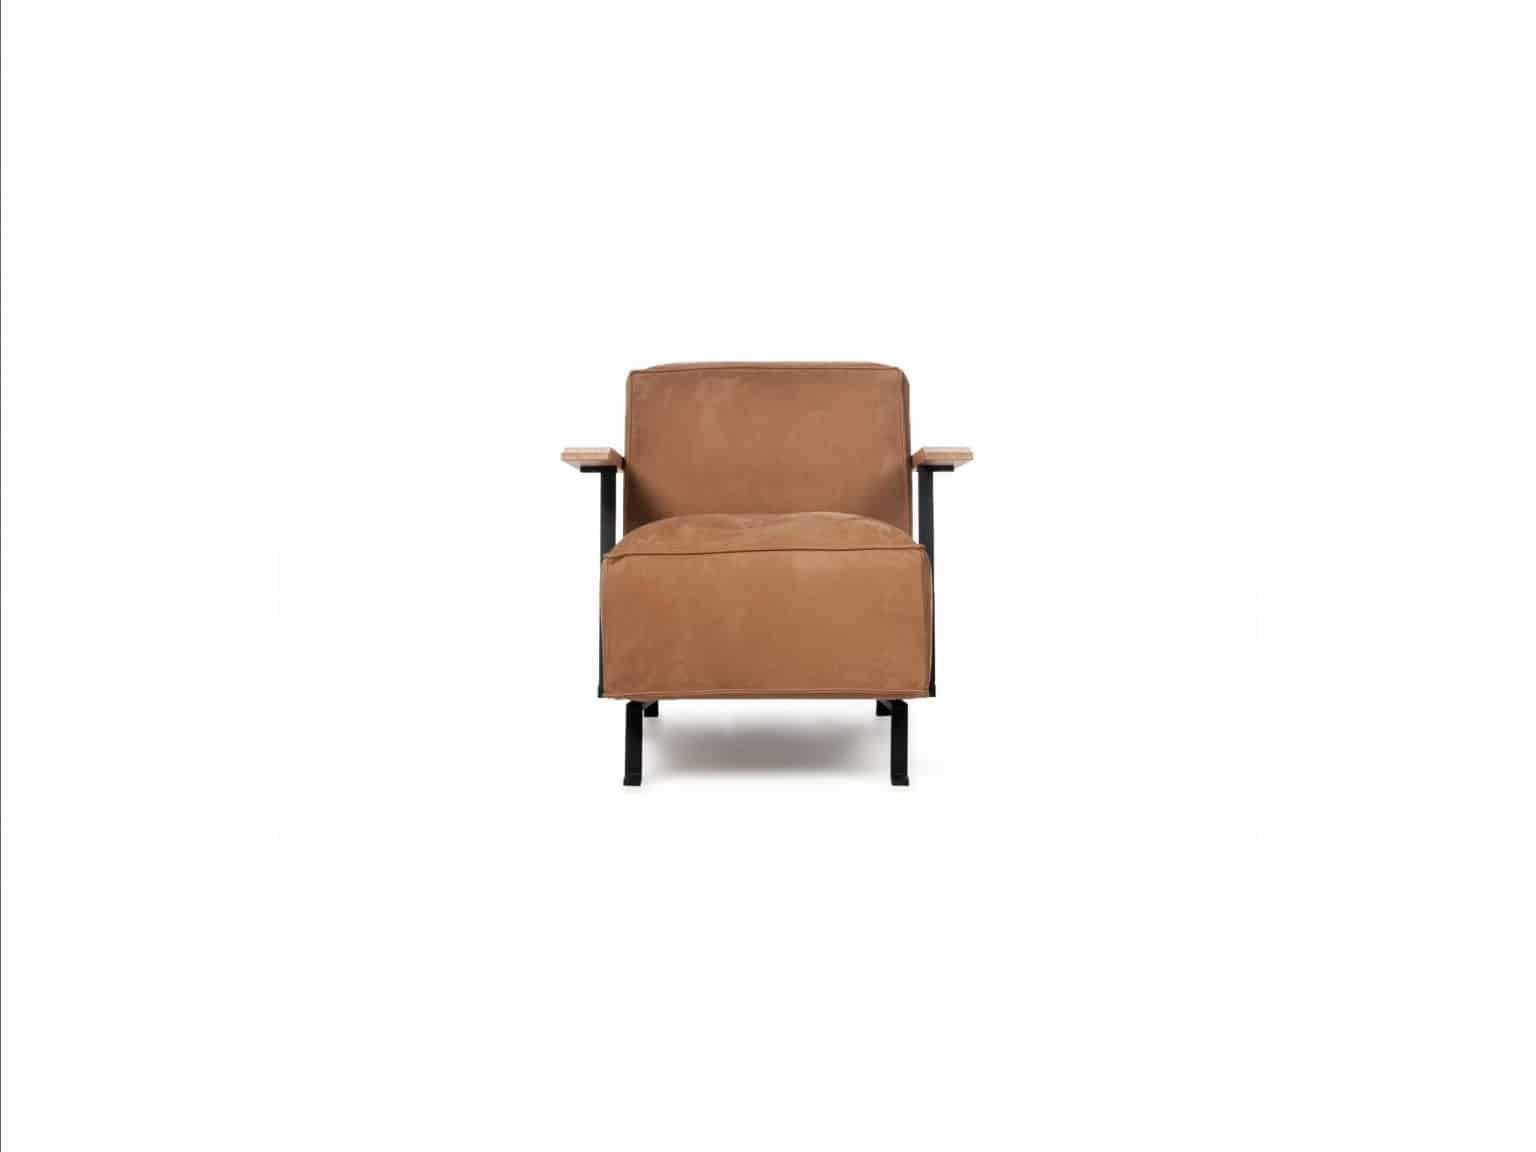 Gelderland fauteuil 6401 pa